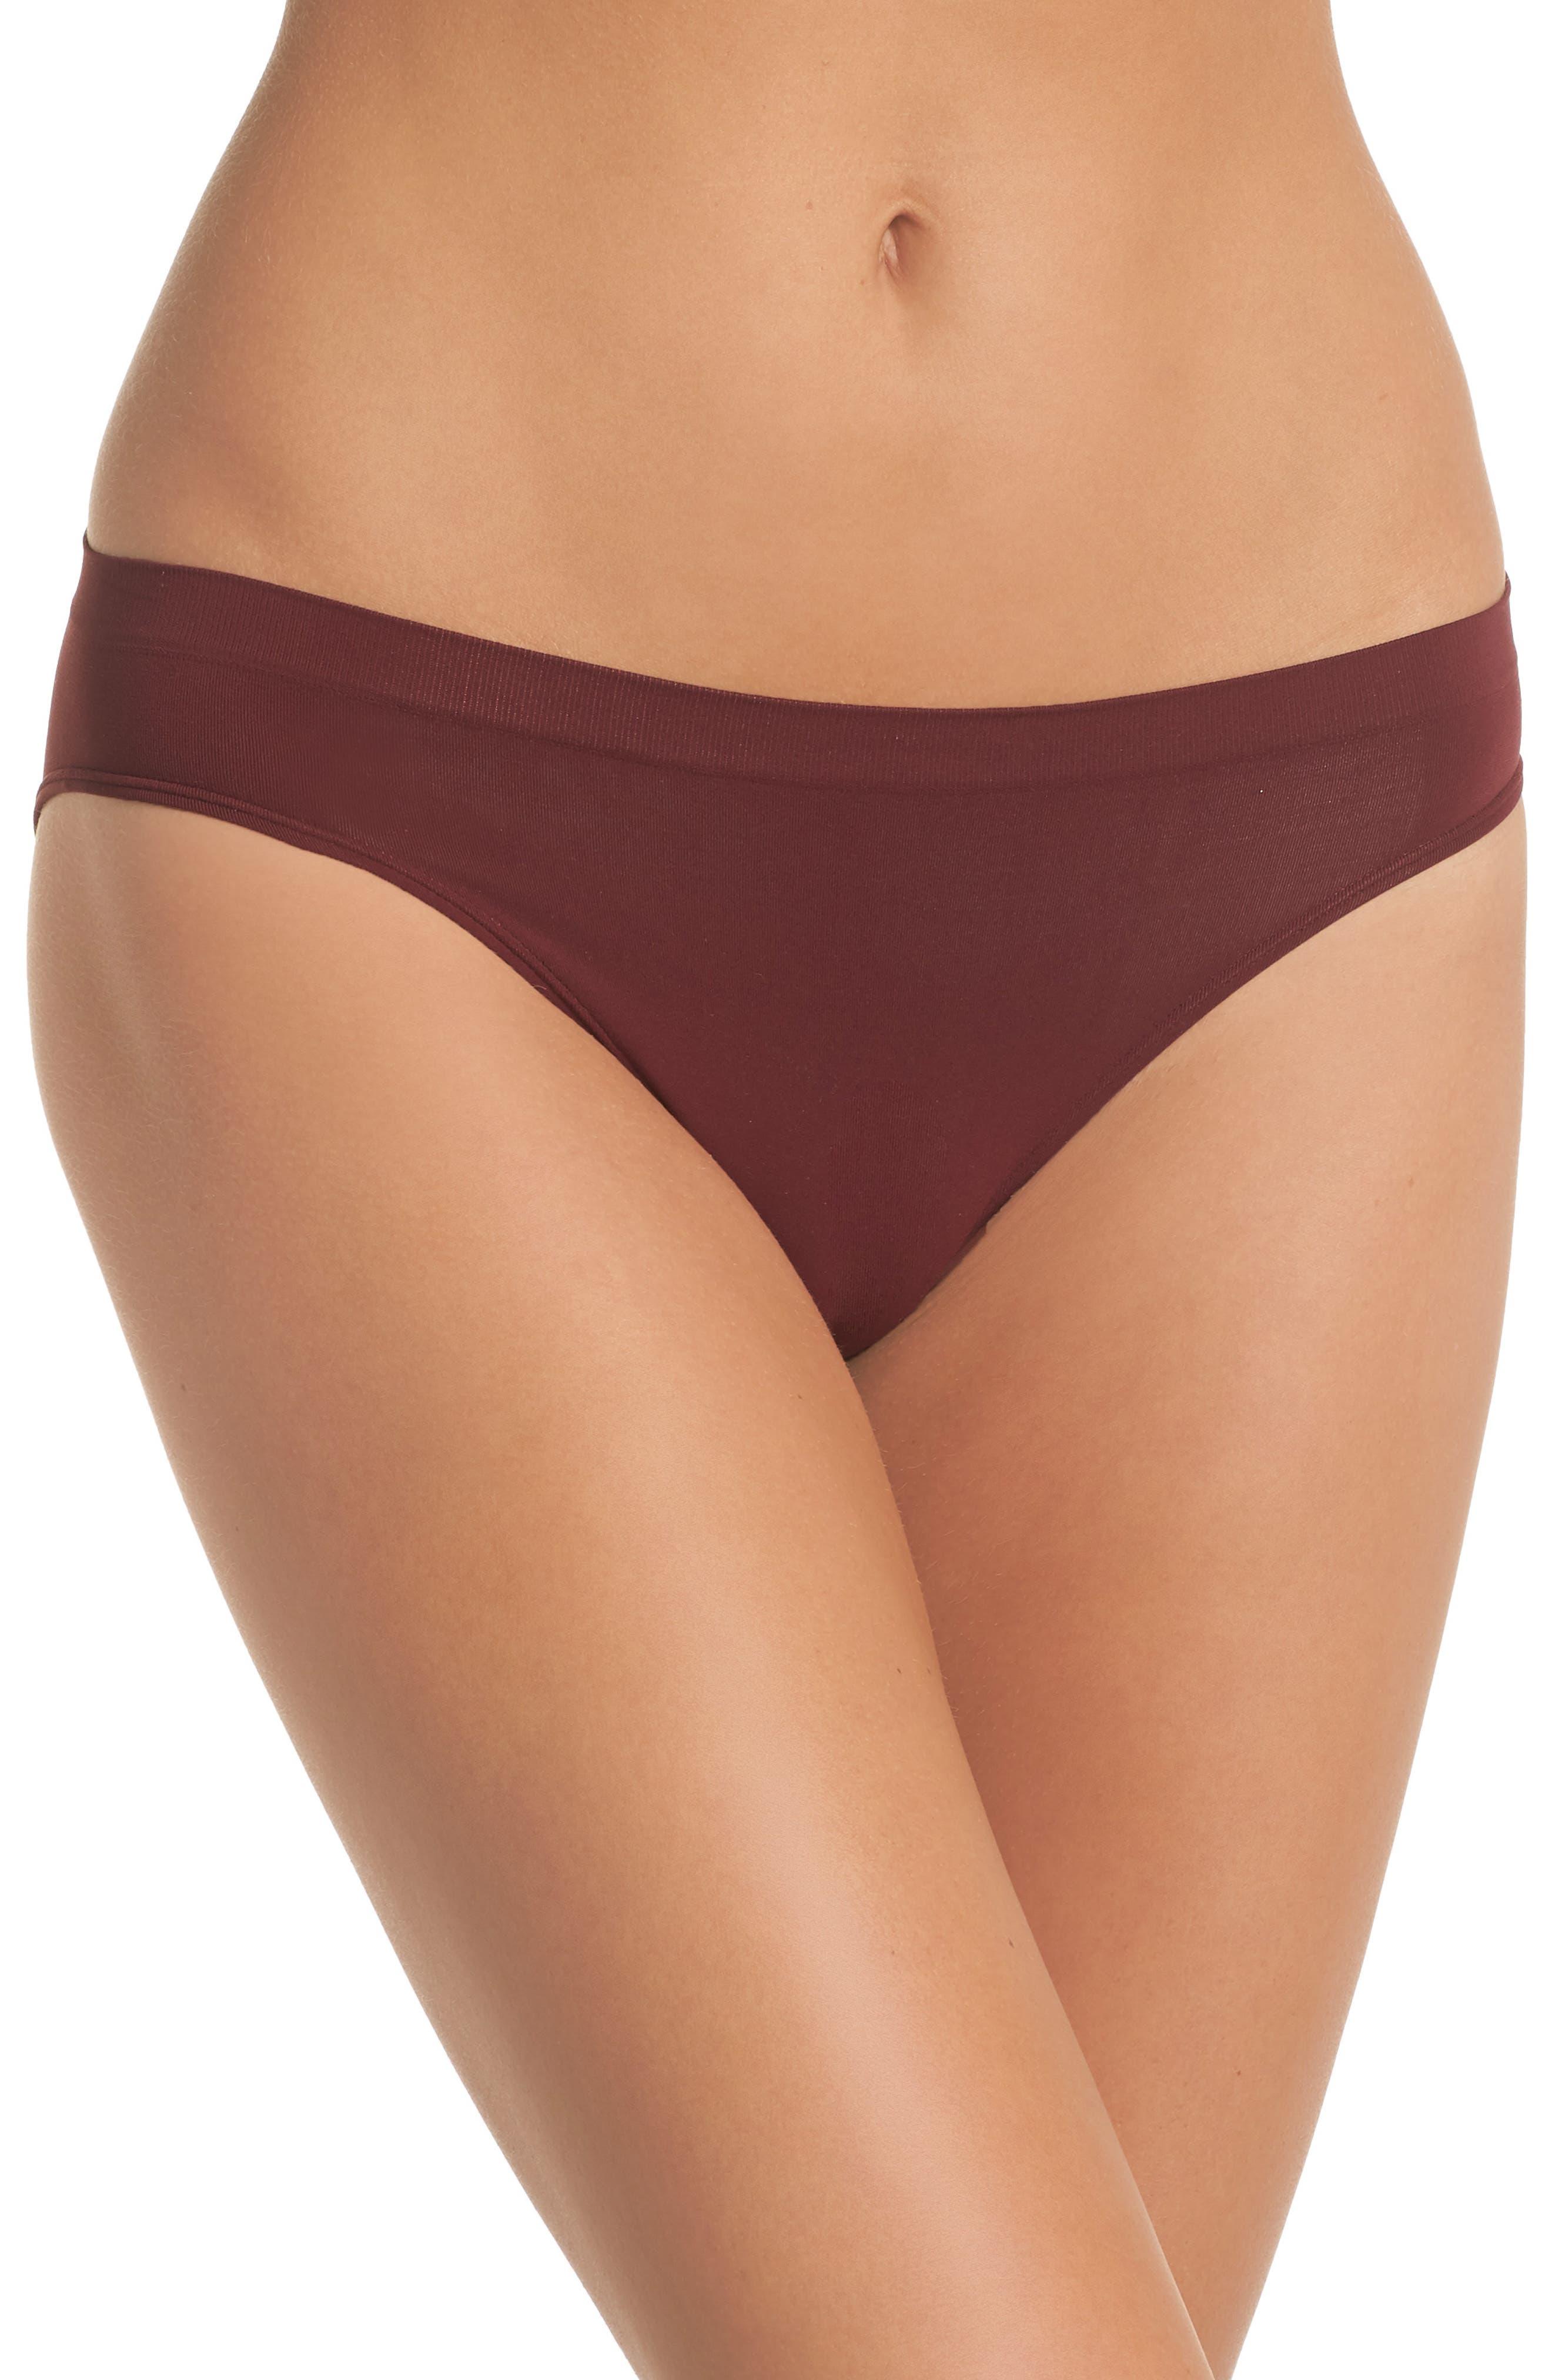 Seamless Bikini,                         Main,                         color, RED TANNIN